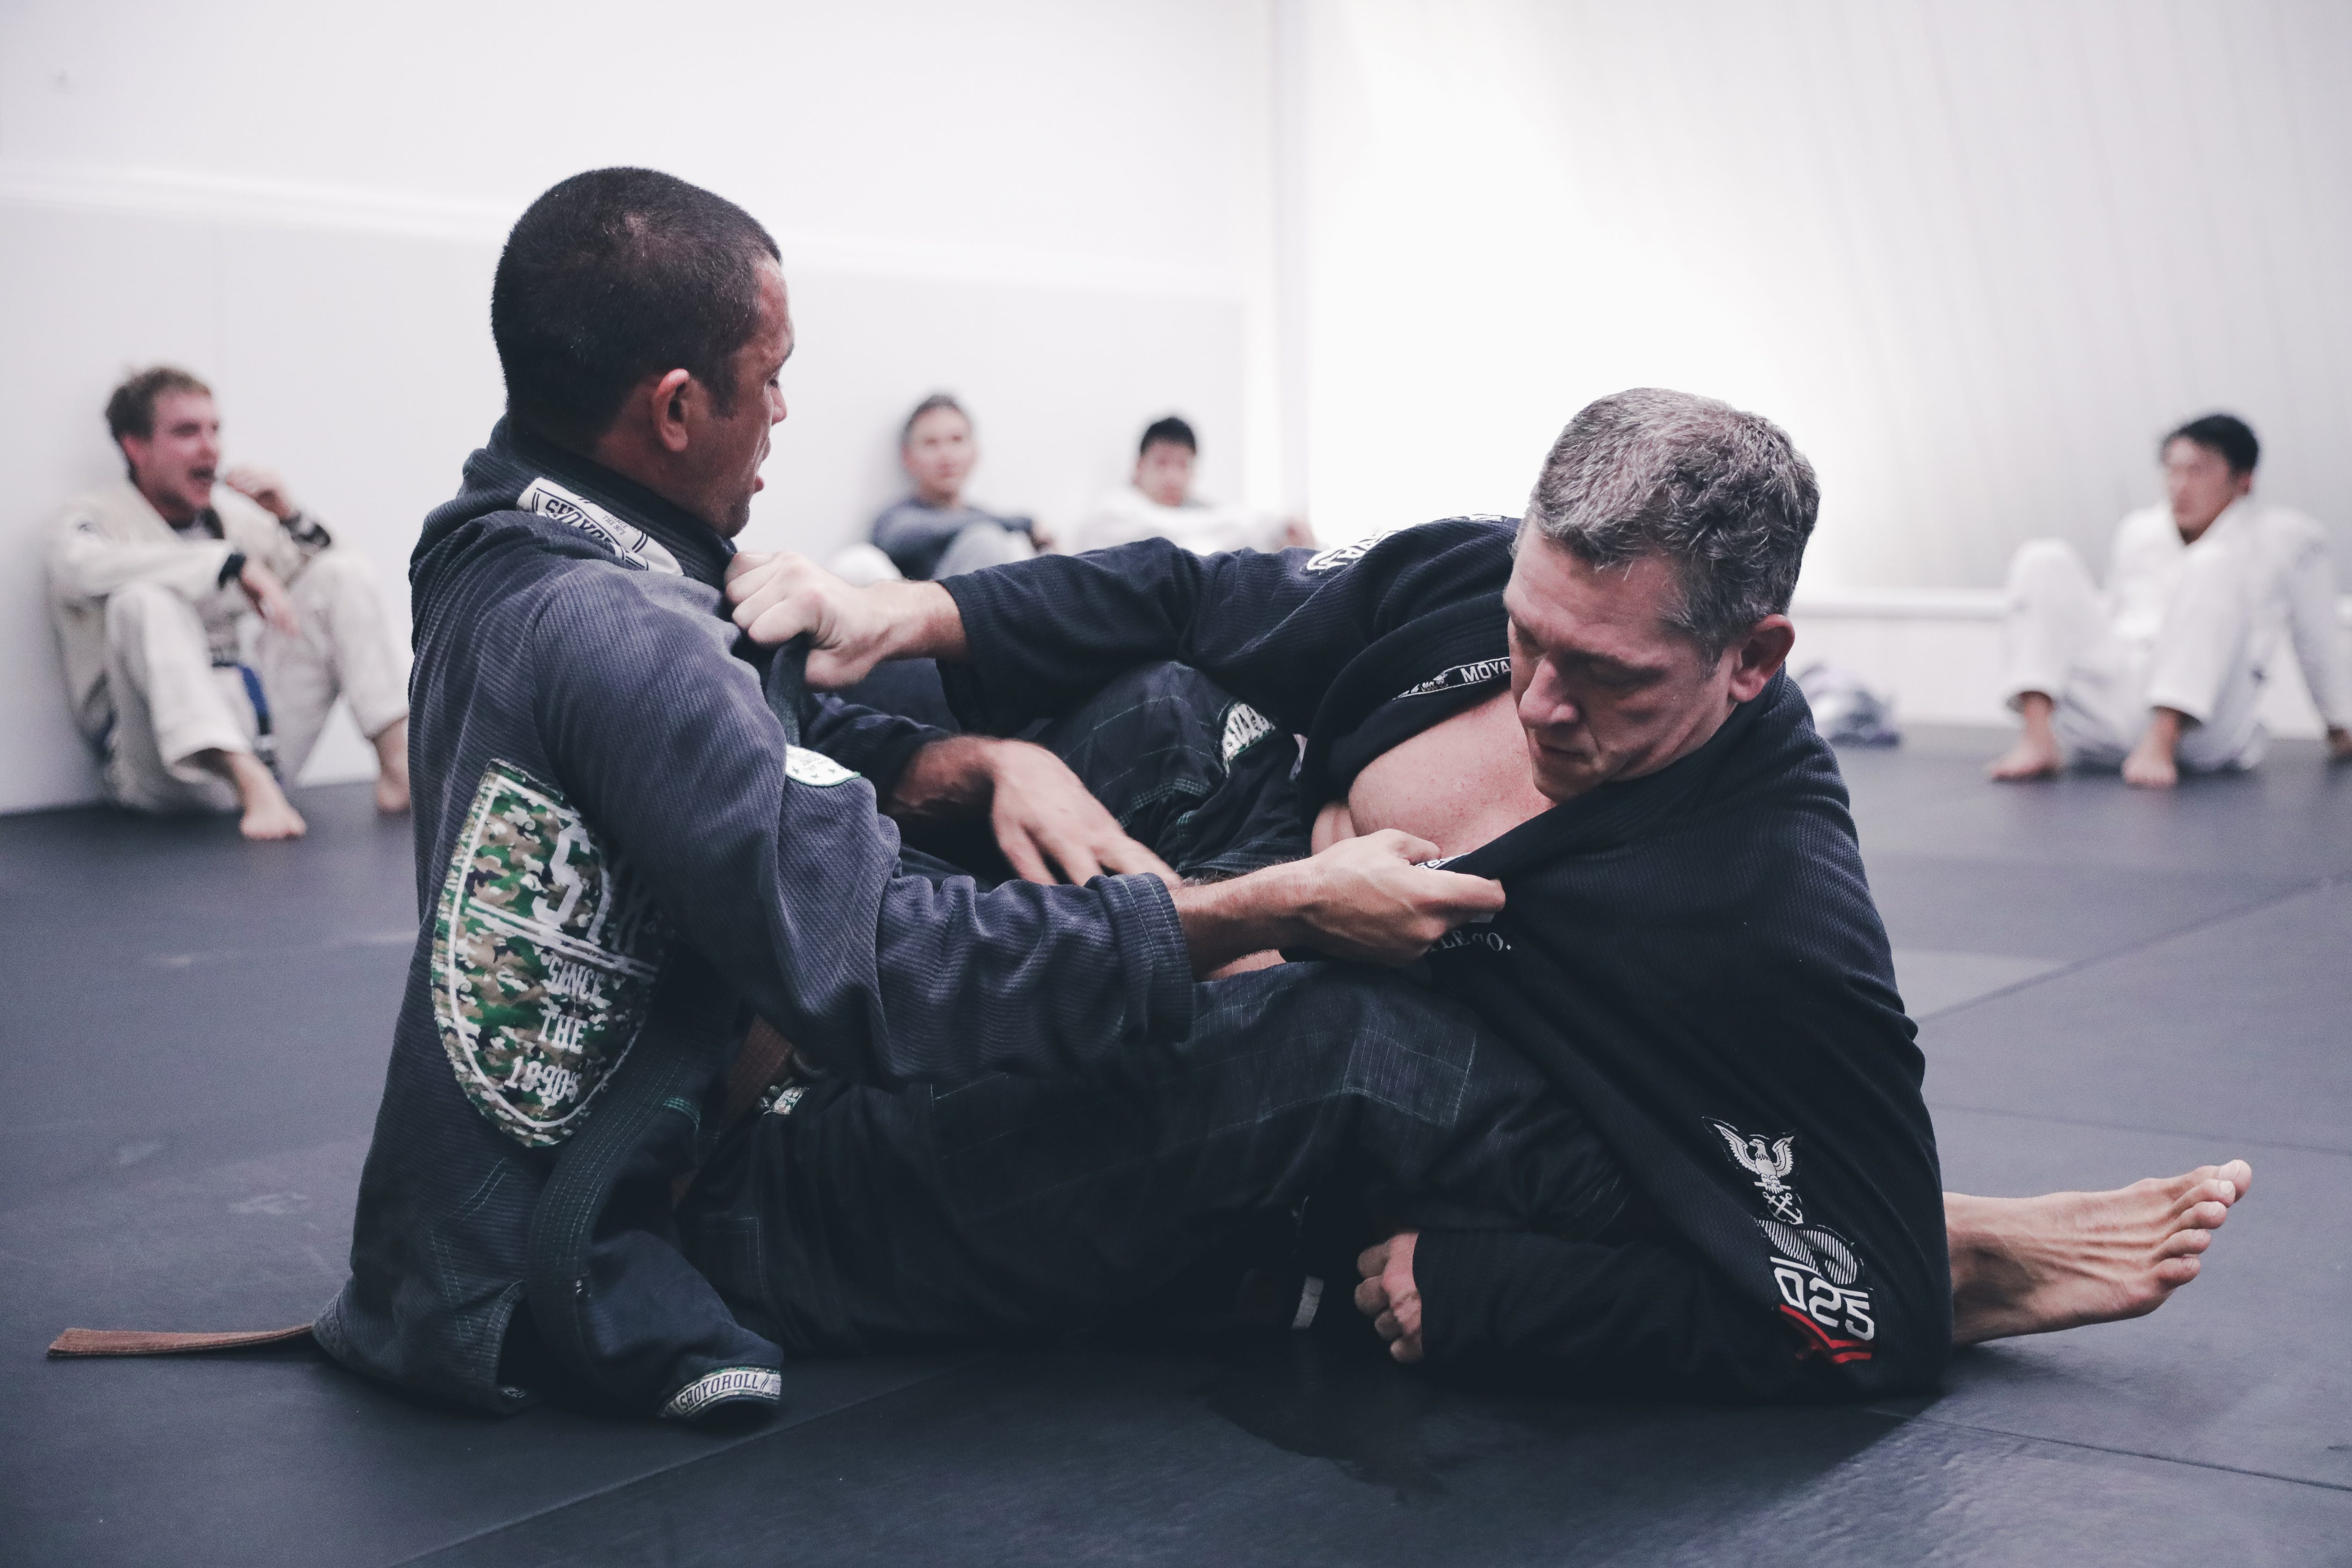 Honolulu Jiu Jitsu